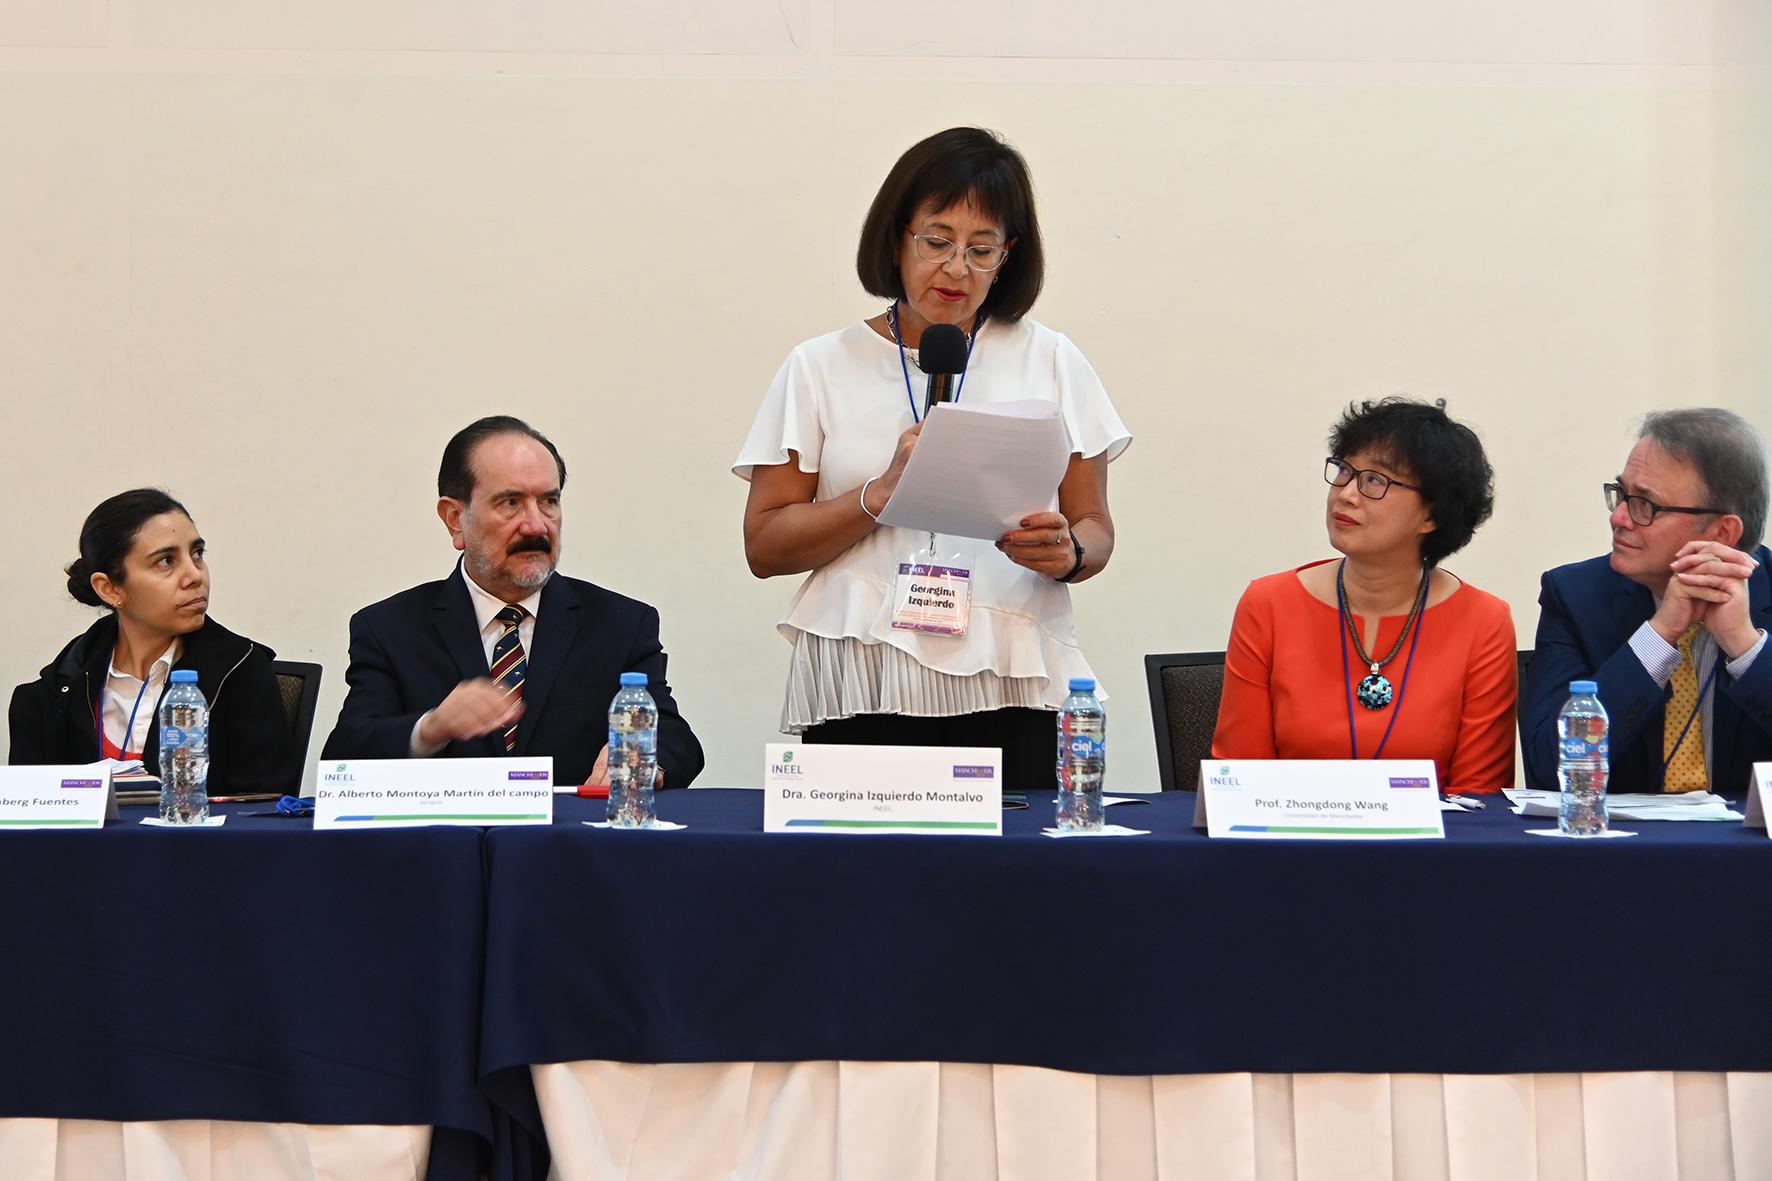 Nuestra Directora General Dra. Georgina Izquierdo Montalvo